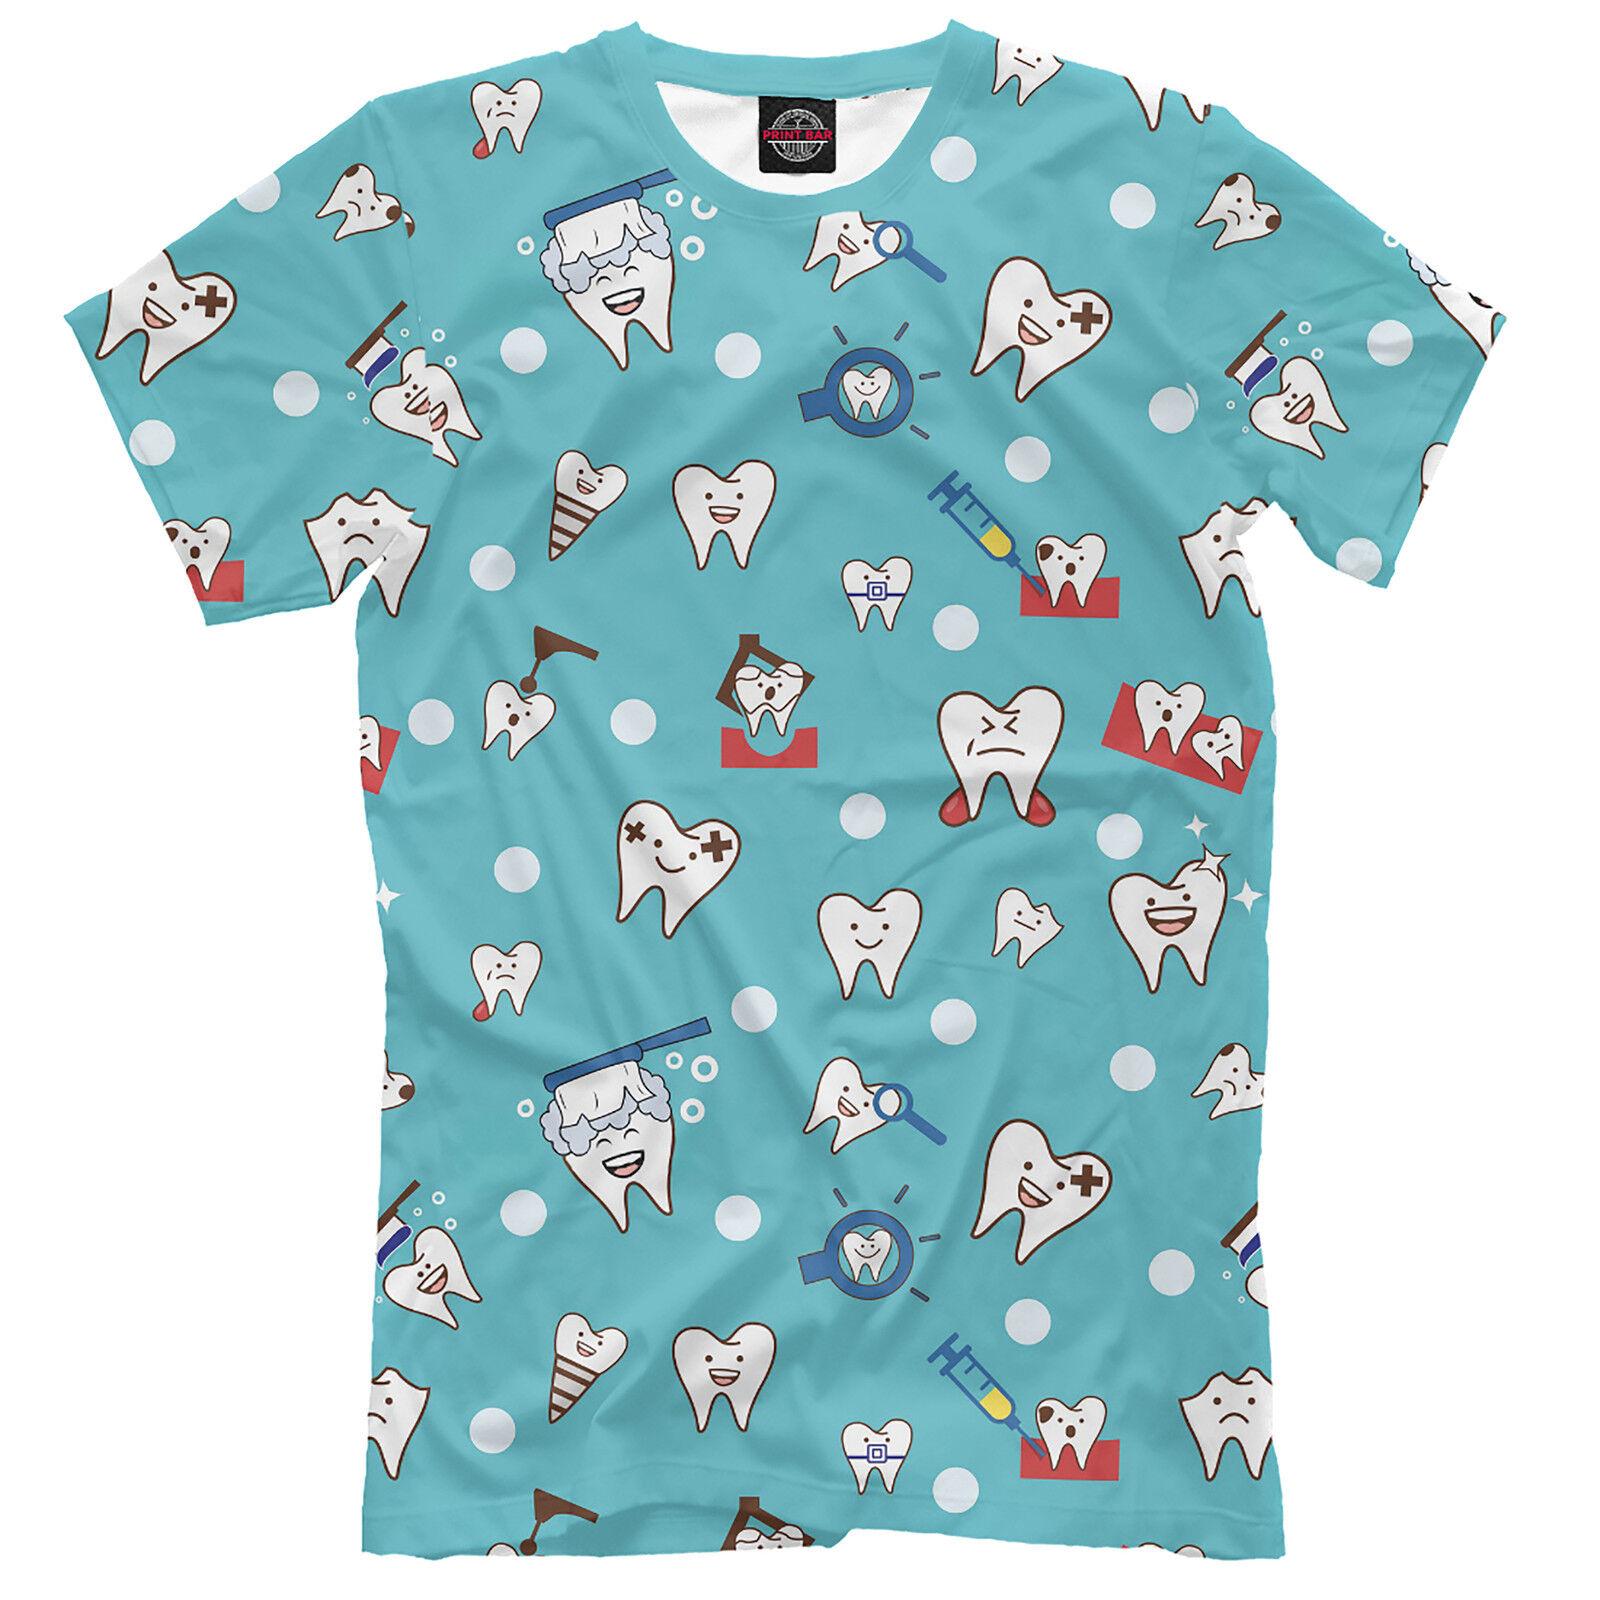 Men's T-shirt - Dentist profession - Teeth - High quality - NEW - ts1005